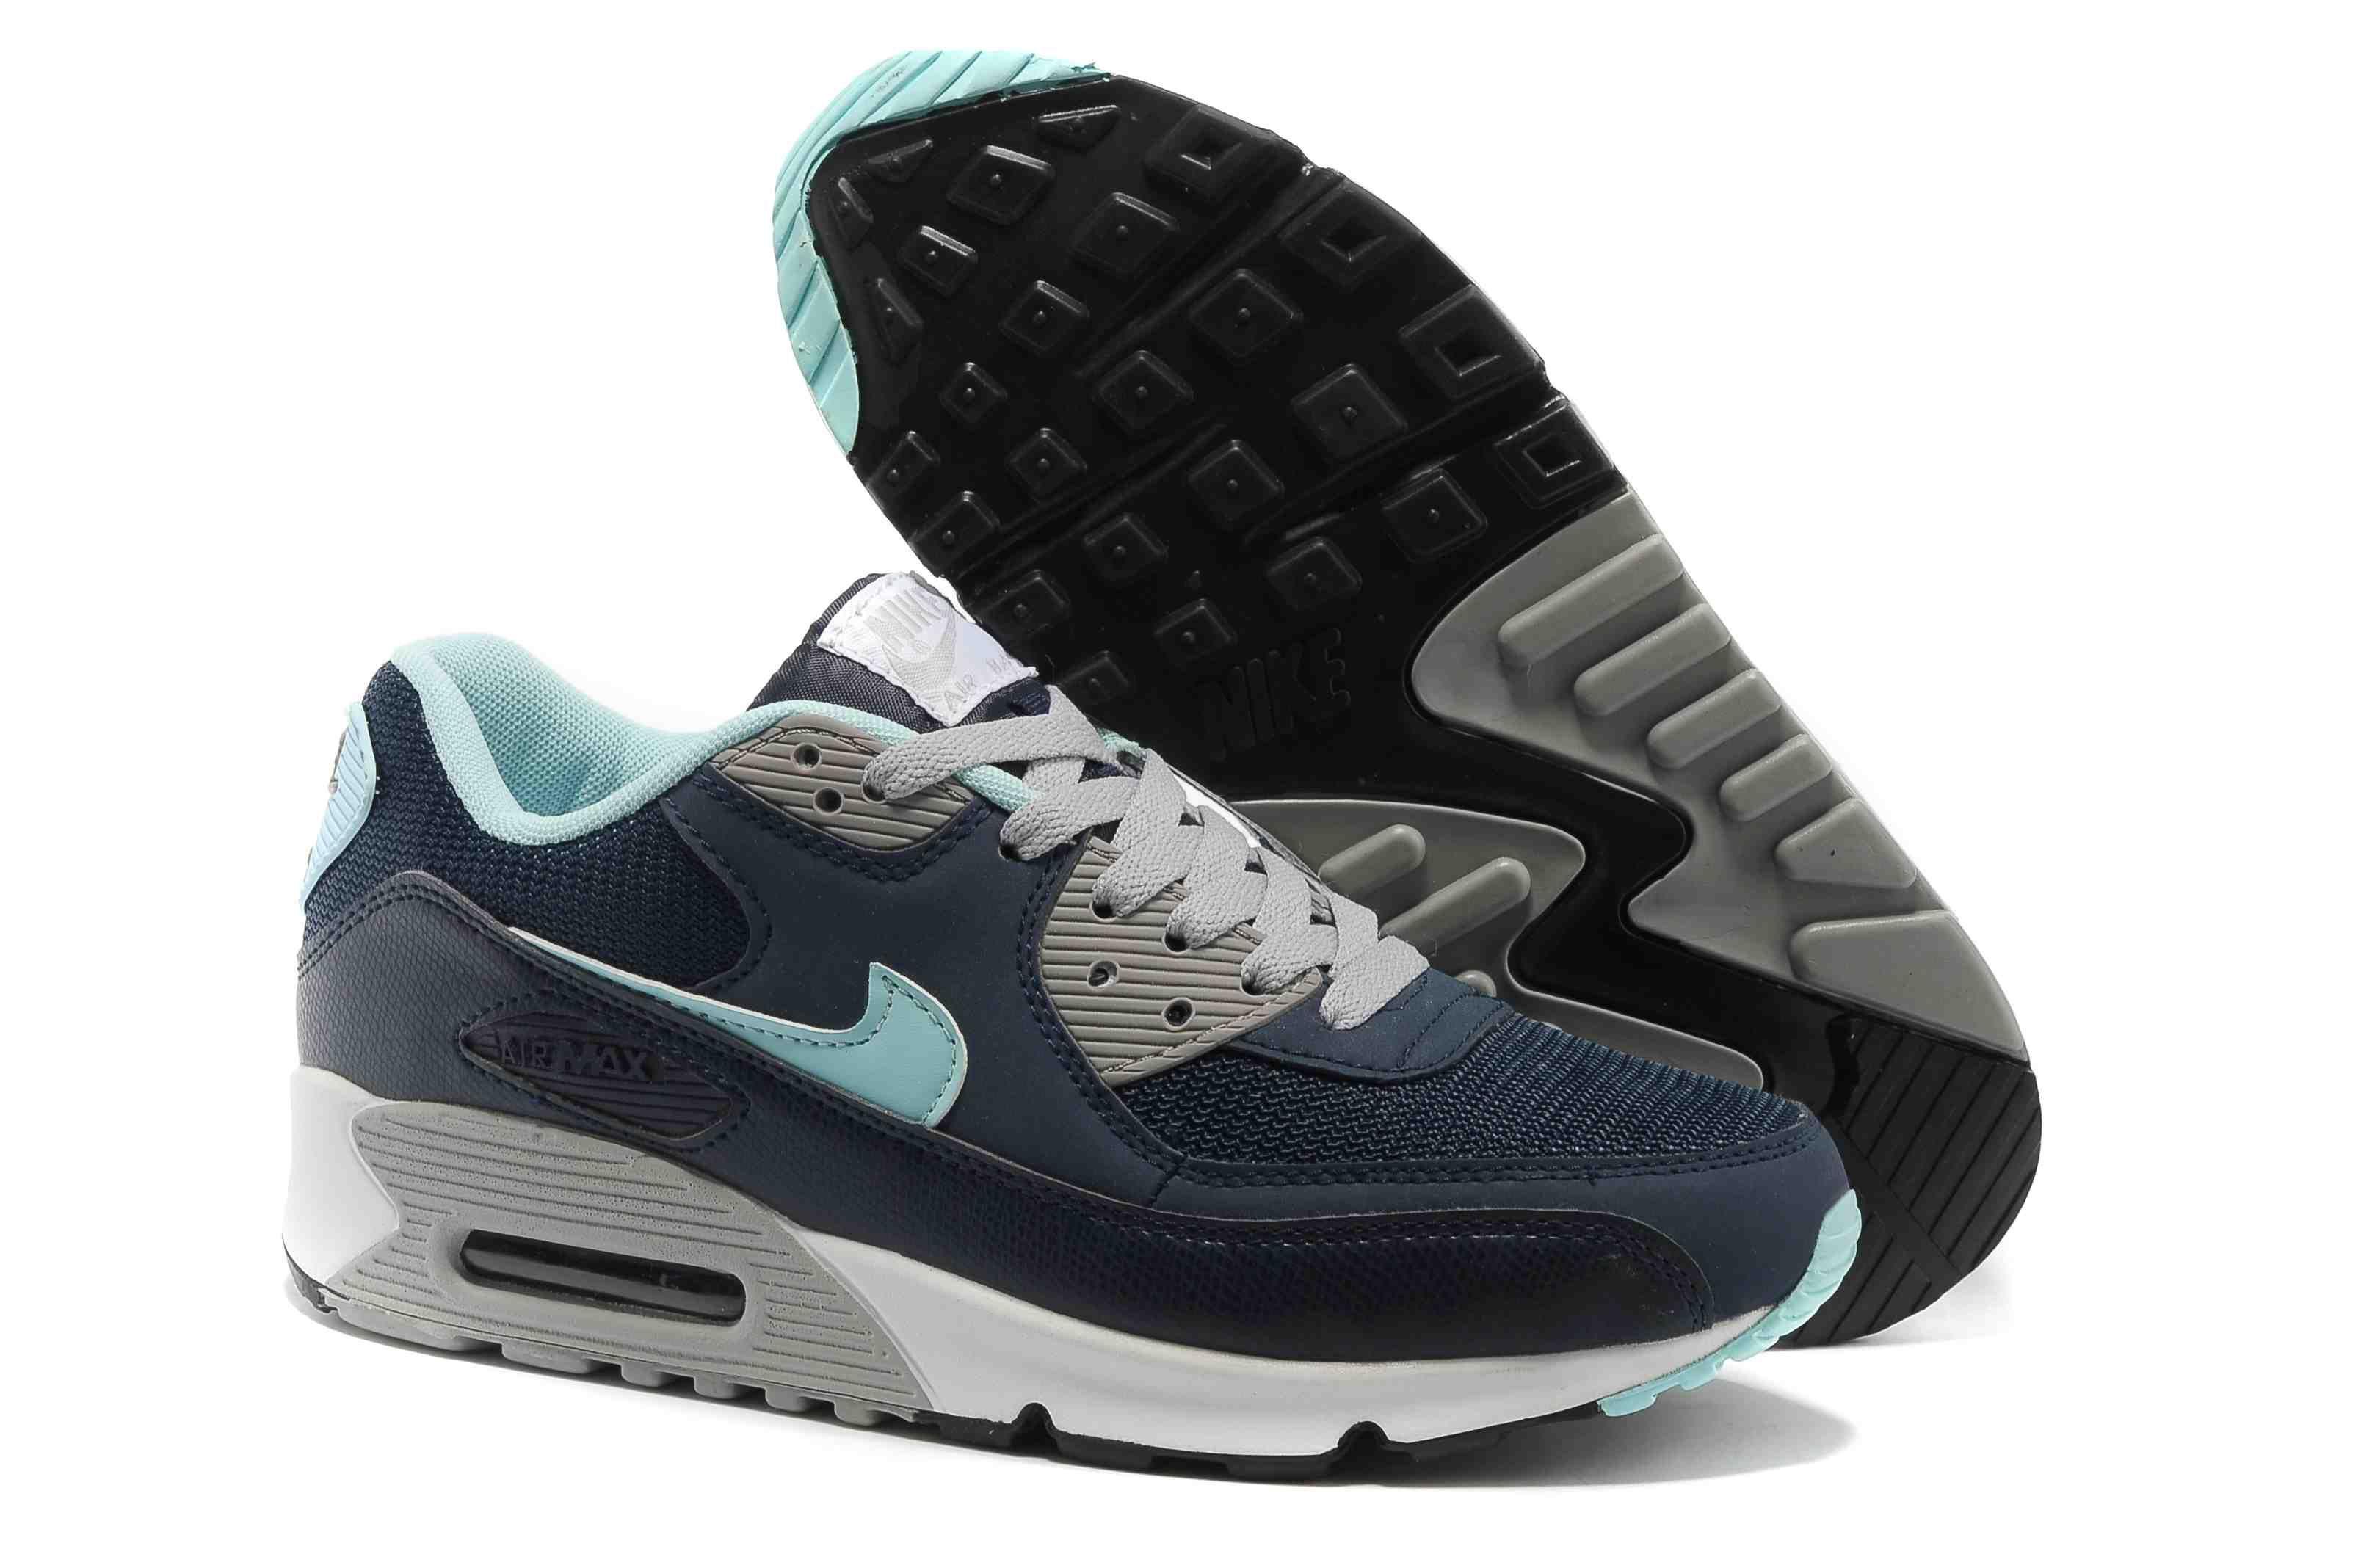 sports shoes e2bdd 3d81b Air Max Mulheres, Nike Ar Max 90s, Maxes Ar, Nike Barato, Jordan 3, Sapatos  Nike, Sapatos Masculinos, Tubarões